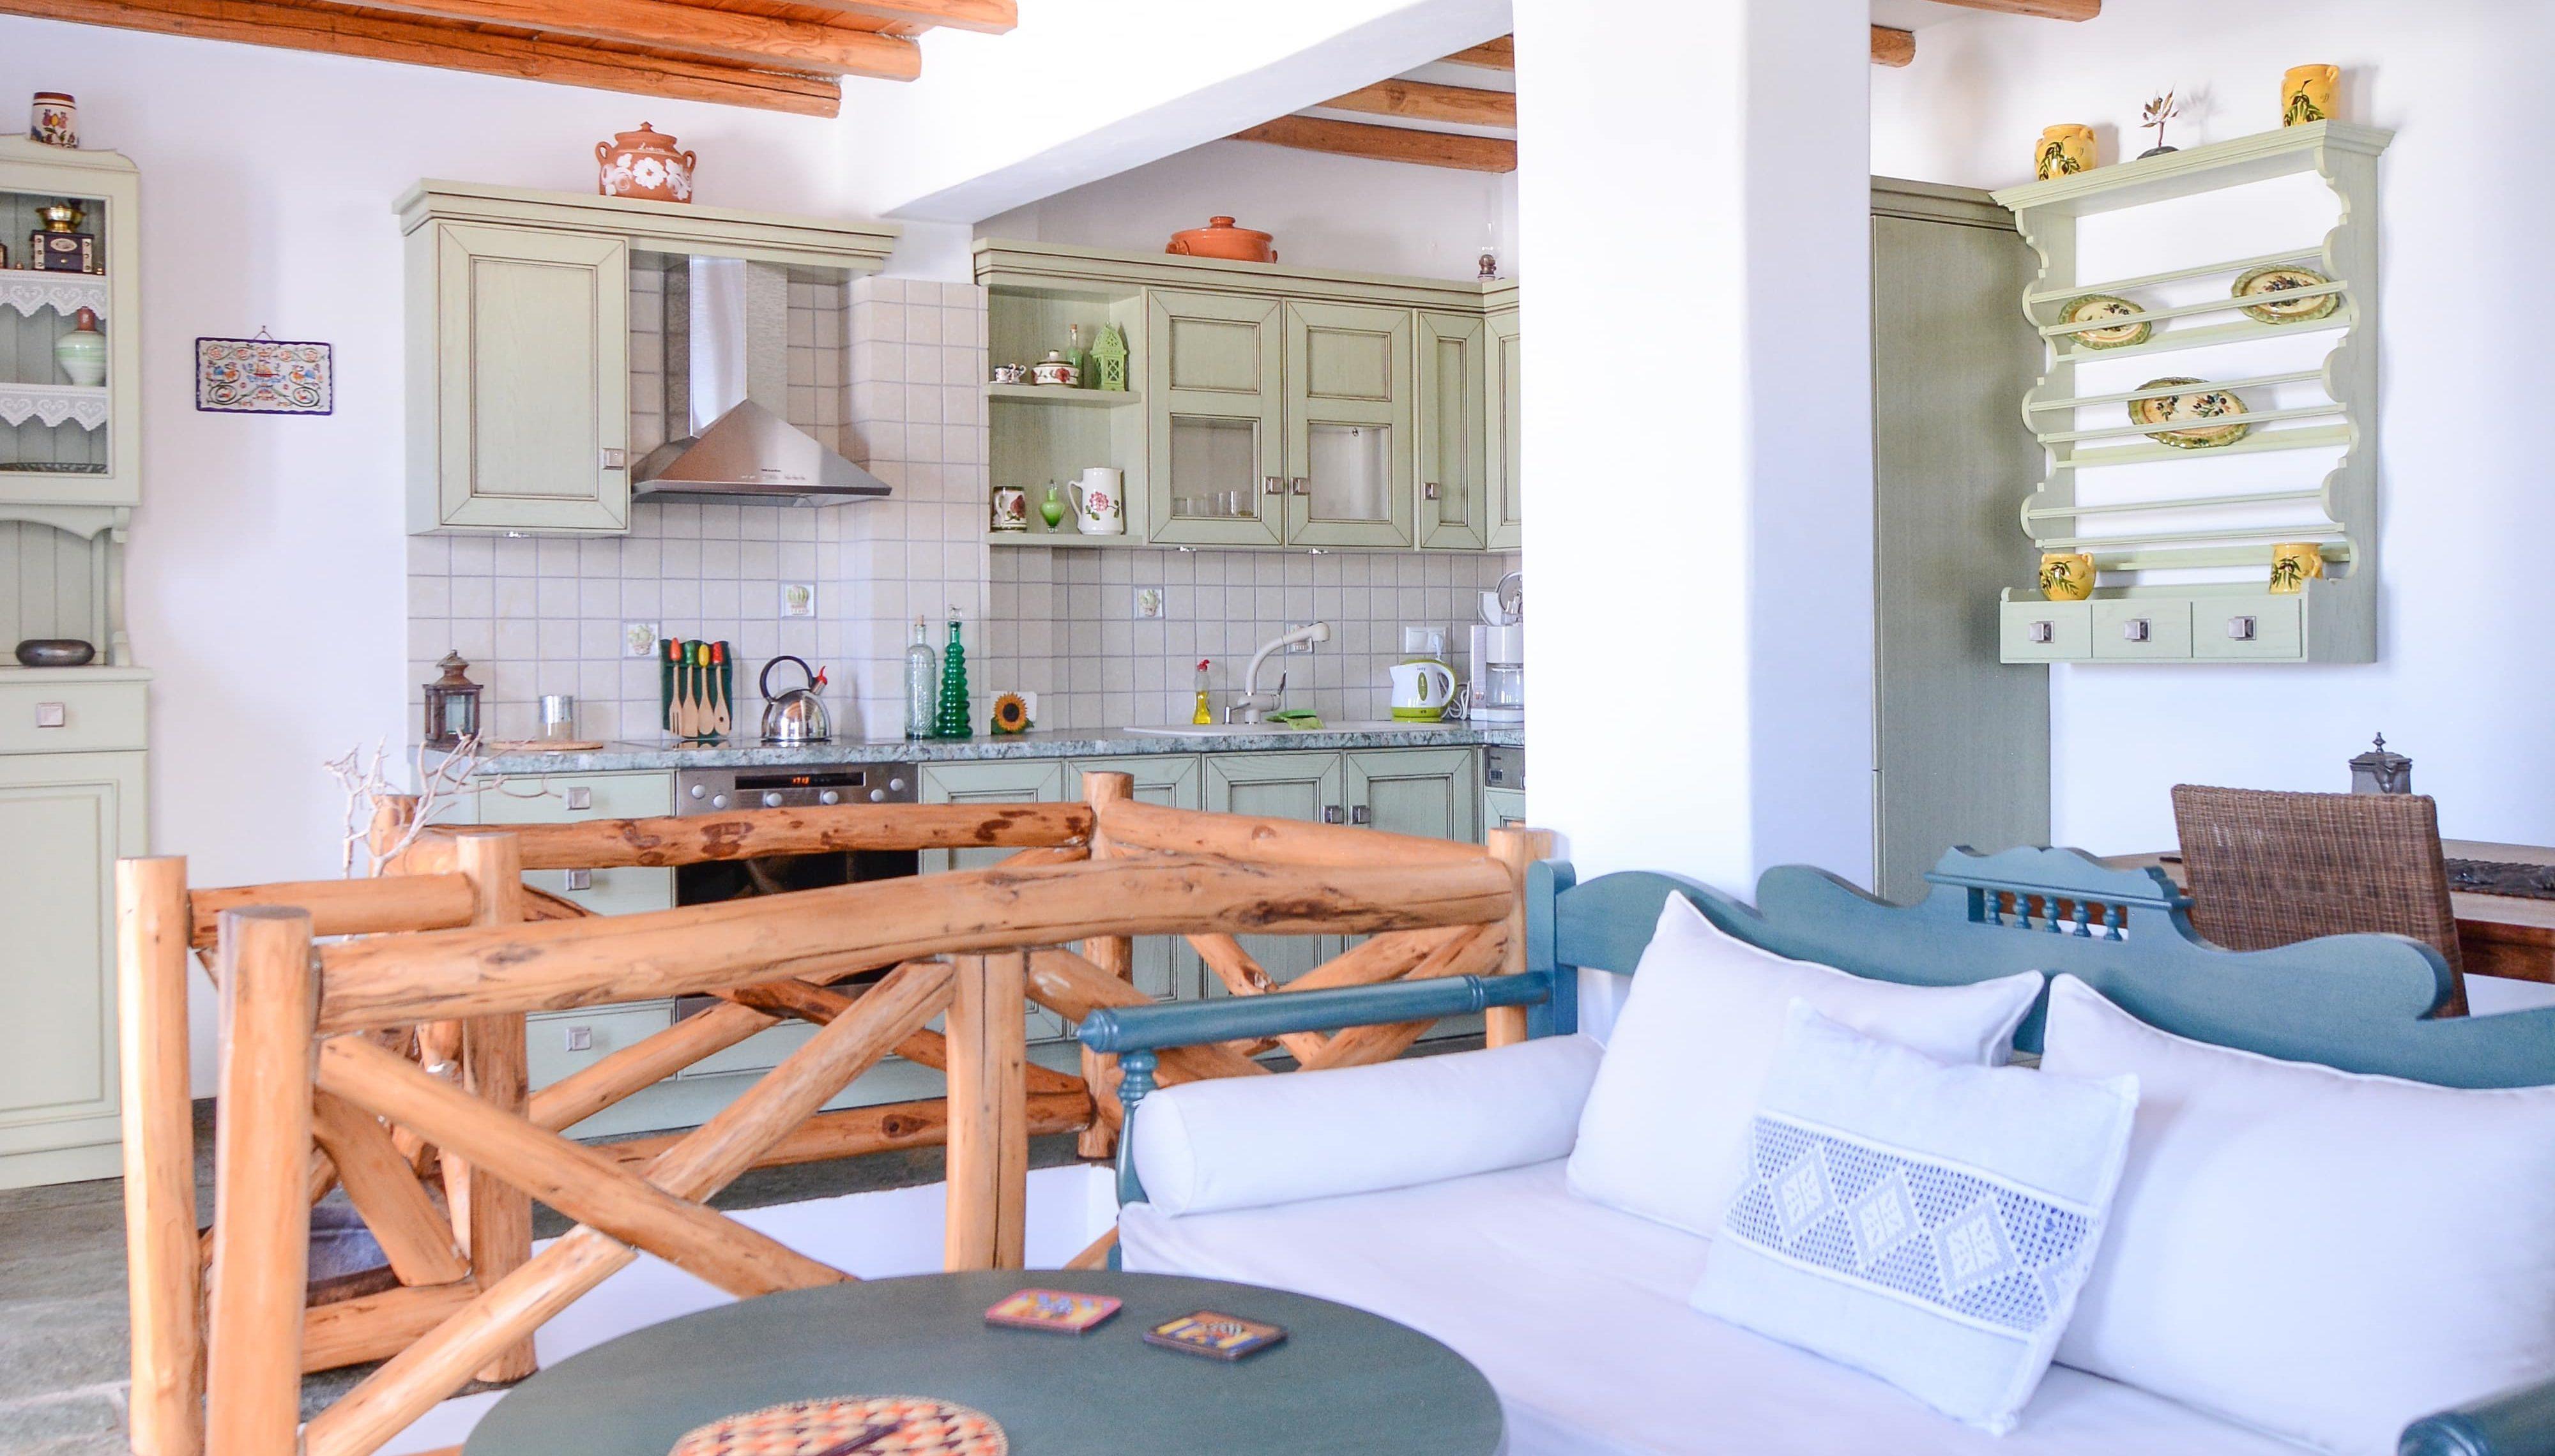 traditional villa living room and kitchen interior